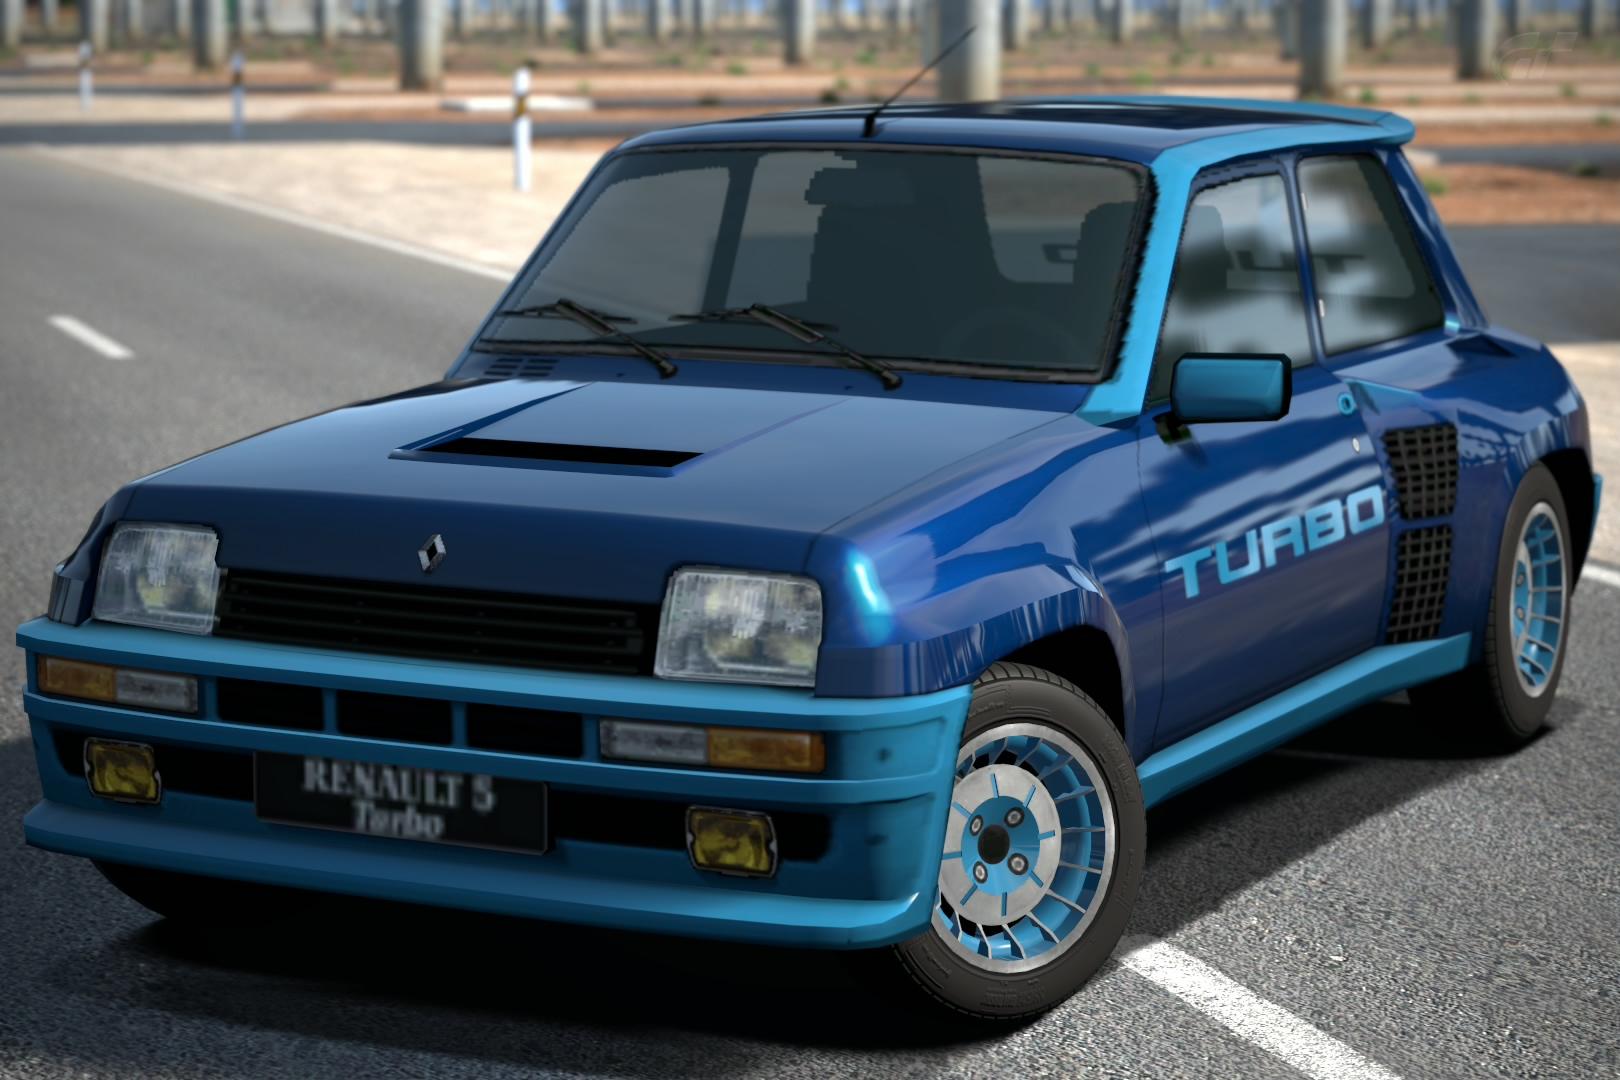 Renault 5 Turbo 80 Gran Turismo Wiki Fandom